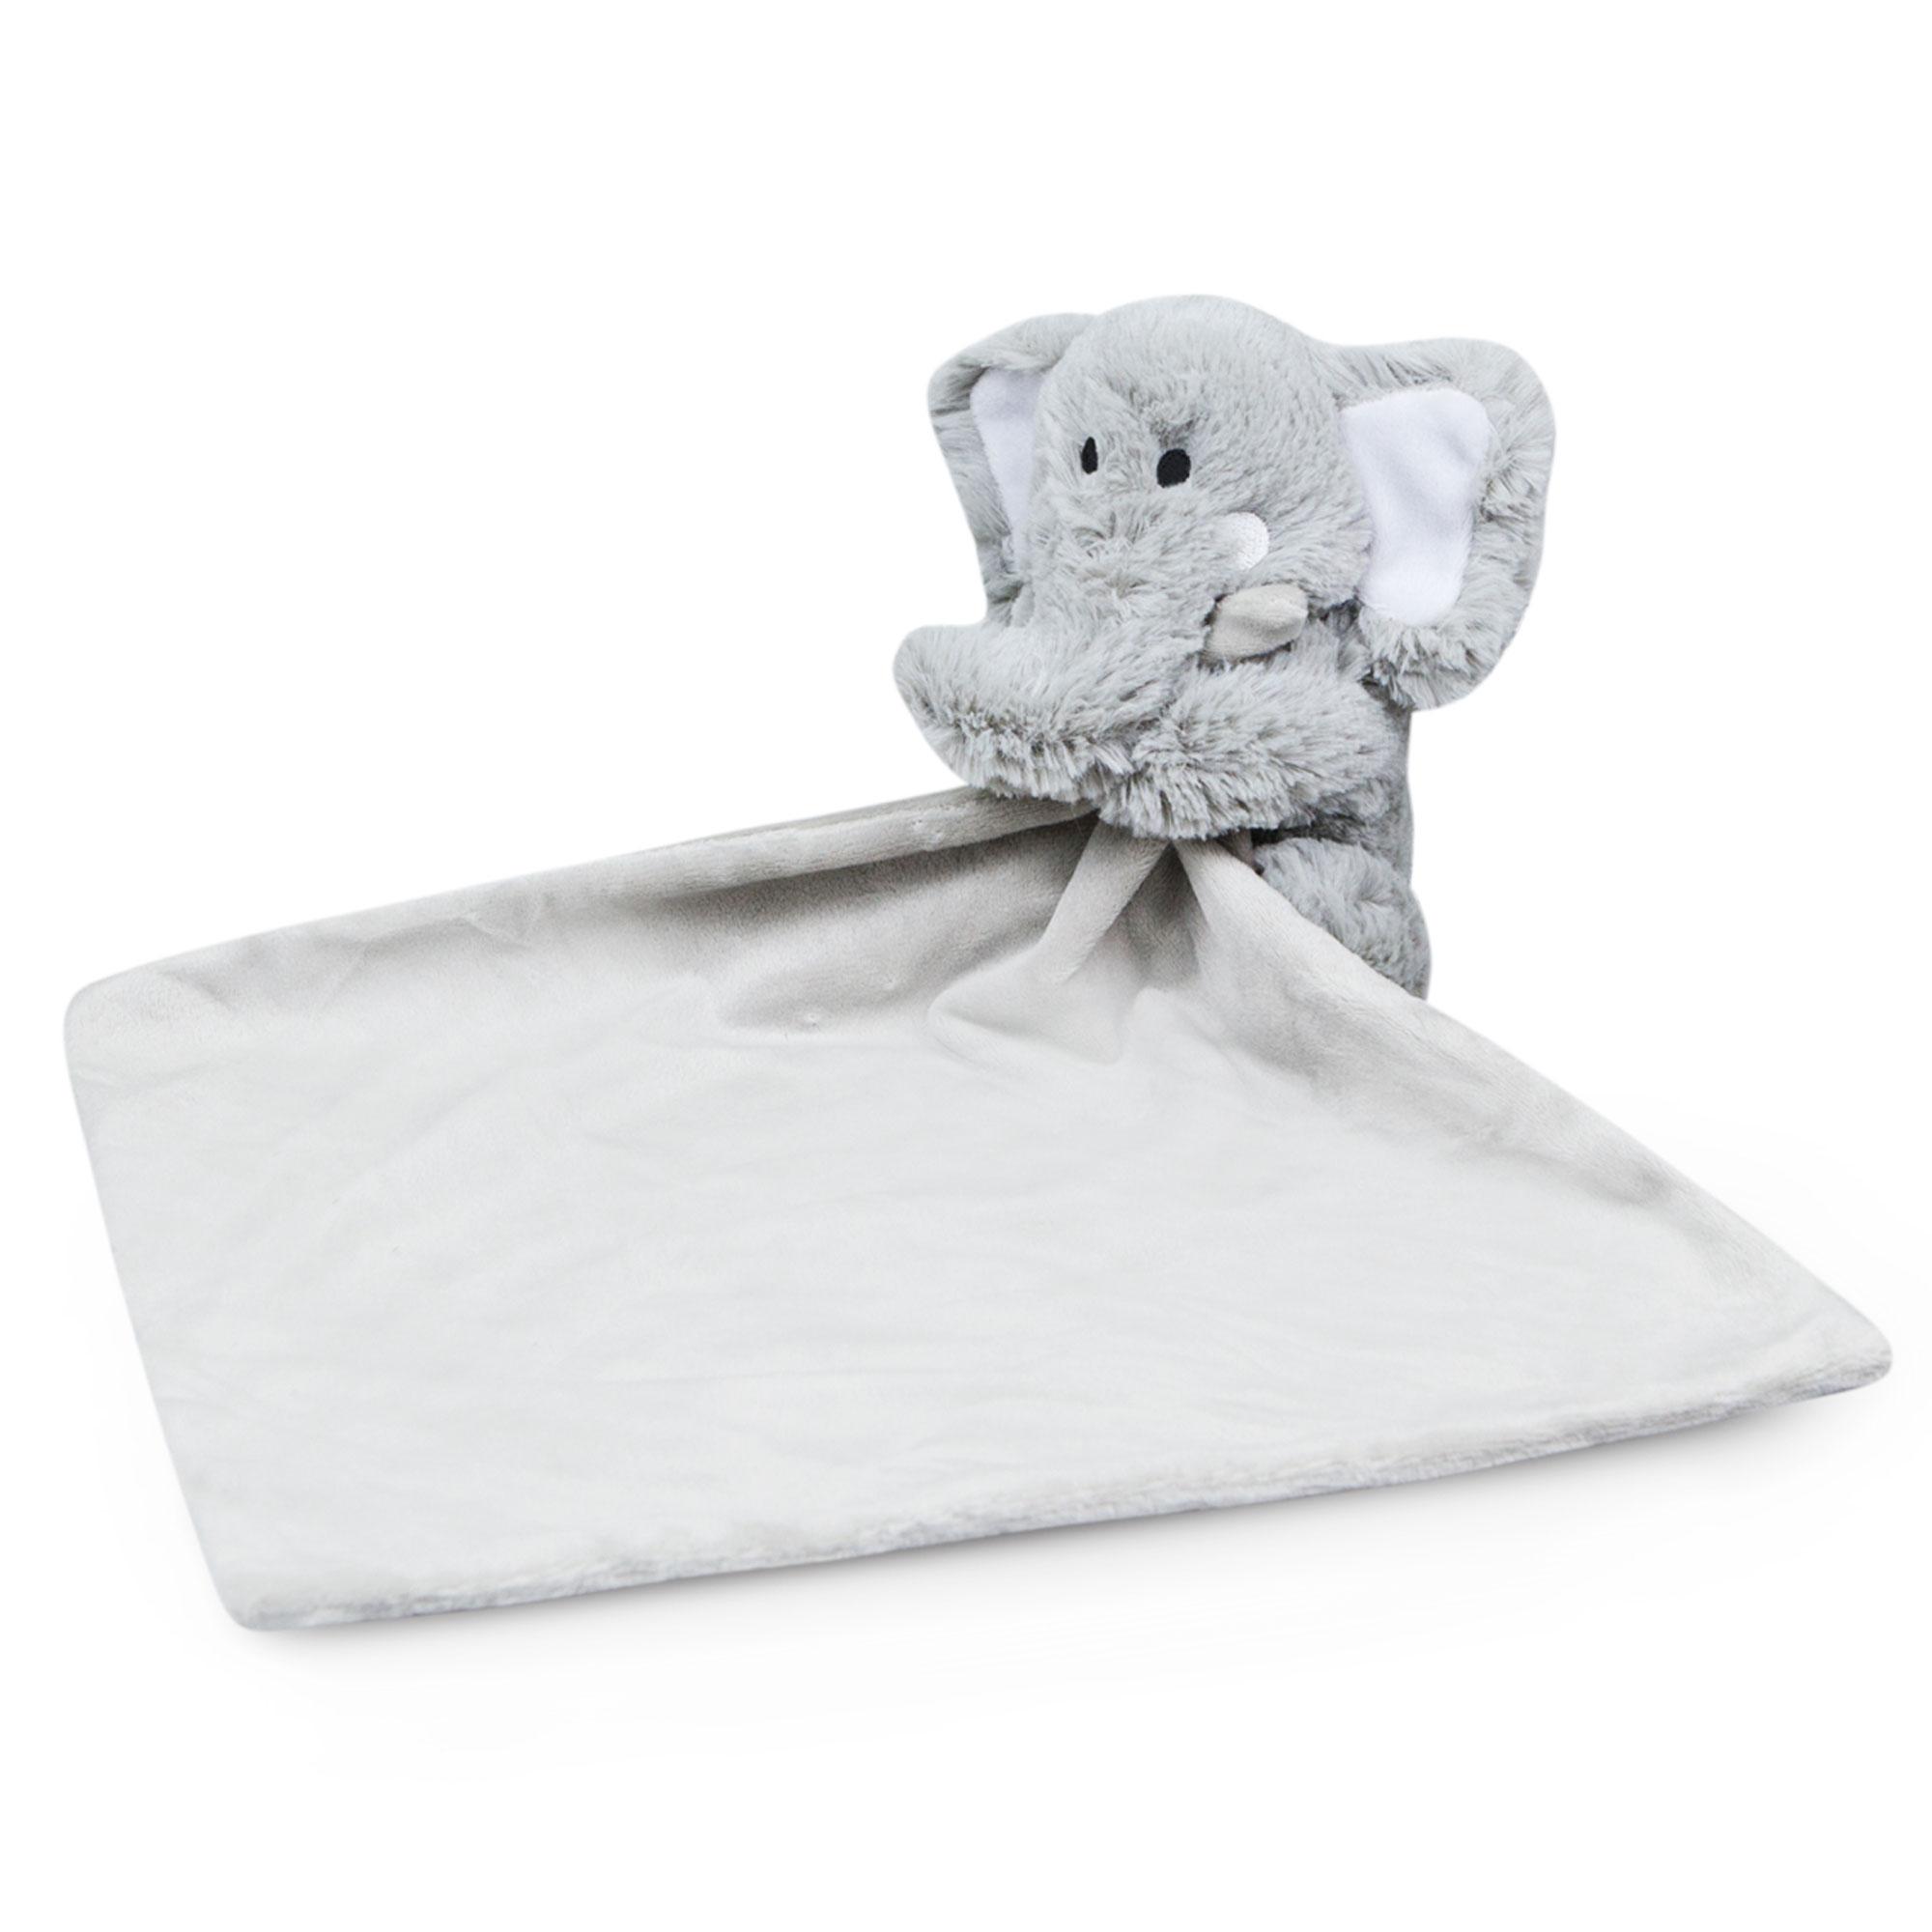 Waddle Elephant Baby Blanket Lovey Stuffed Animal Rattle Toy Nursery